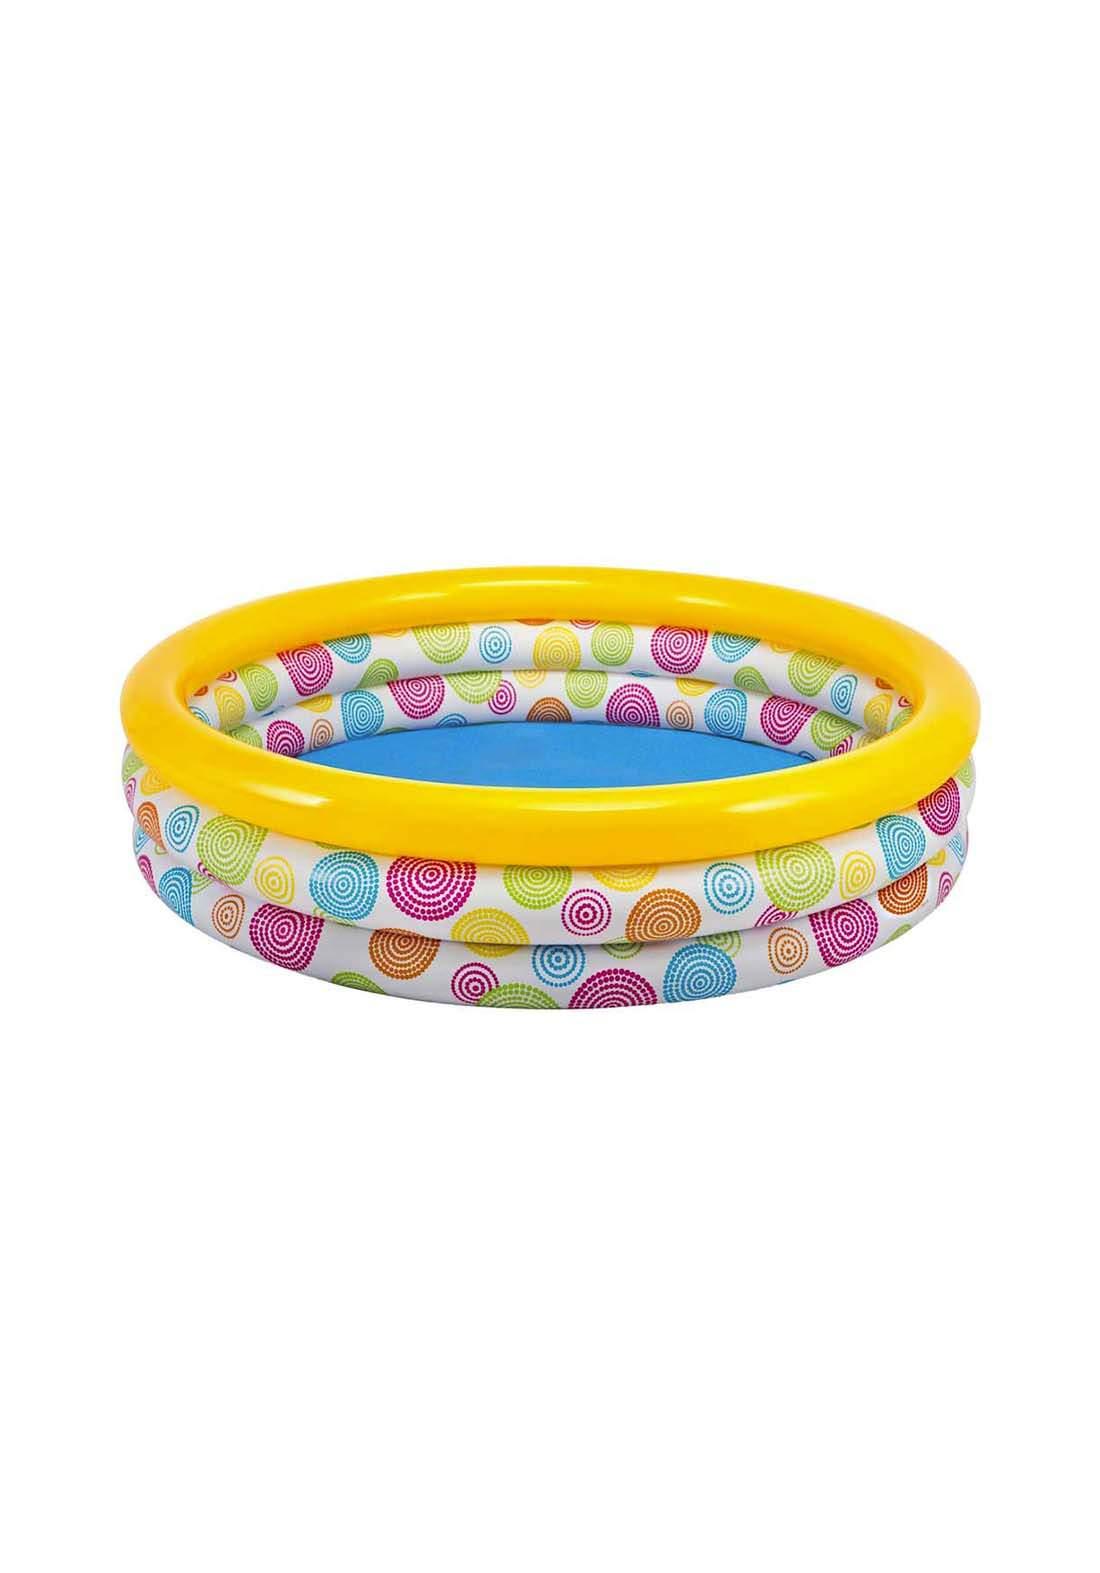 Intex 58448NP Children's inflatable pool مسبح